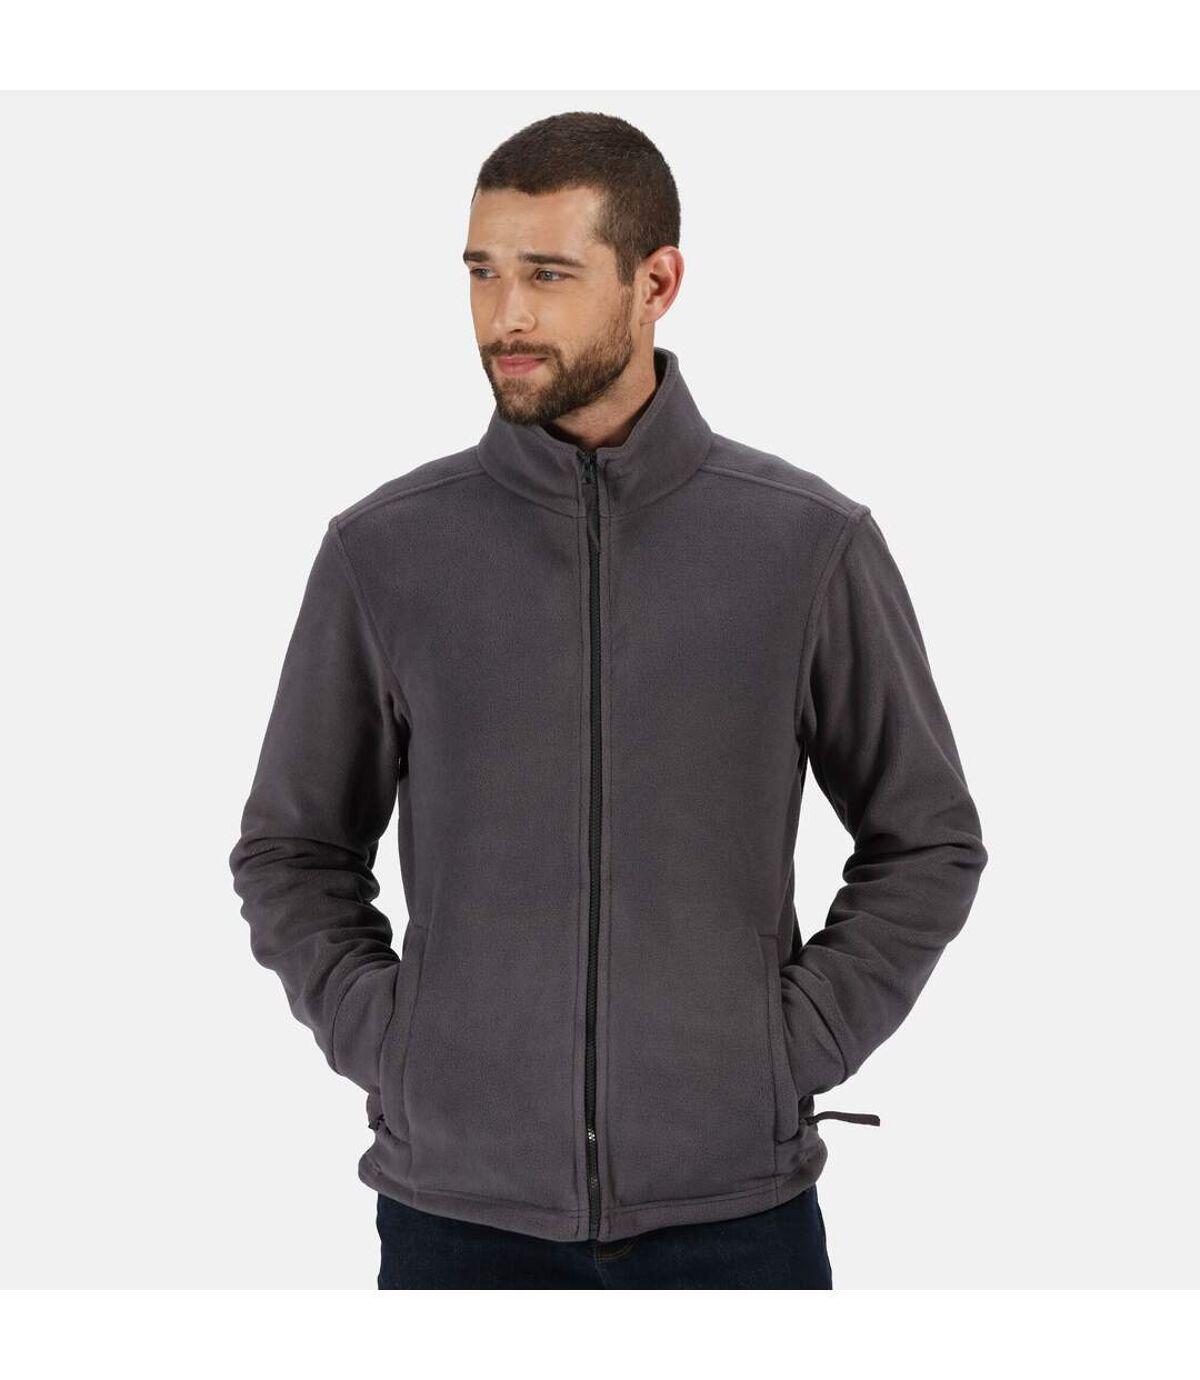 Regatta Professional Mens Thor 300 Fleece Jacket (Dark Navy) - UTRW3990